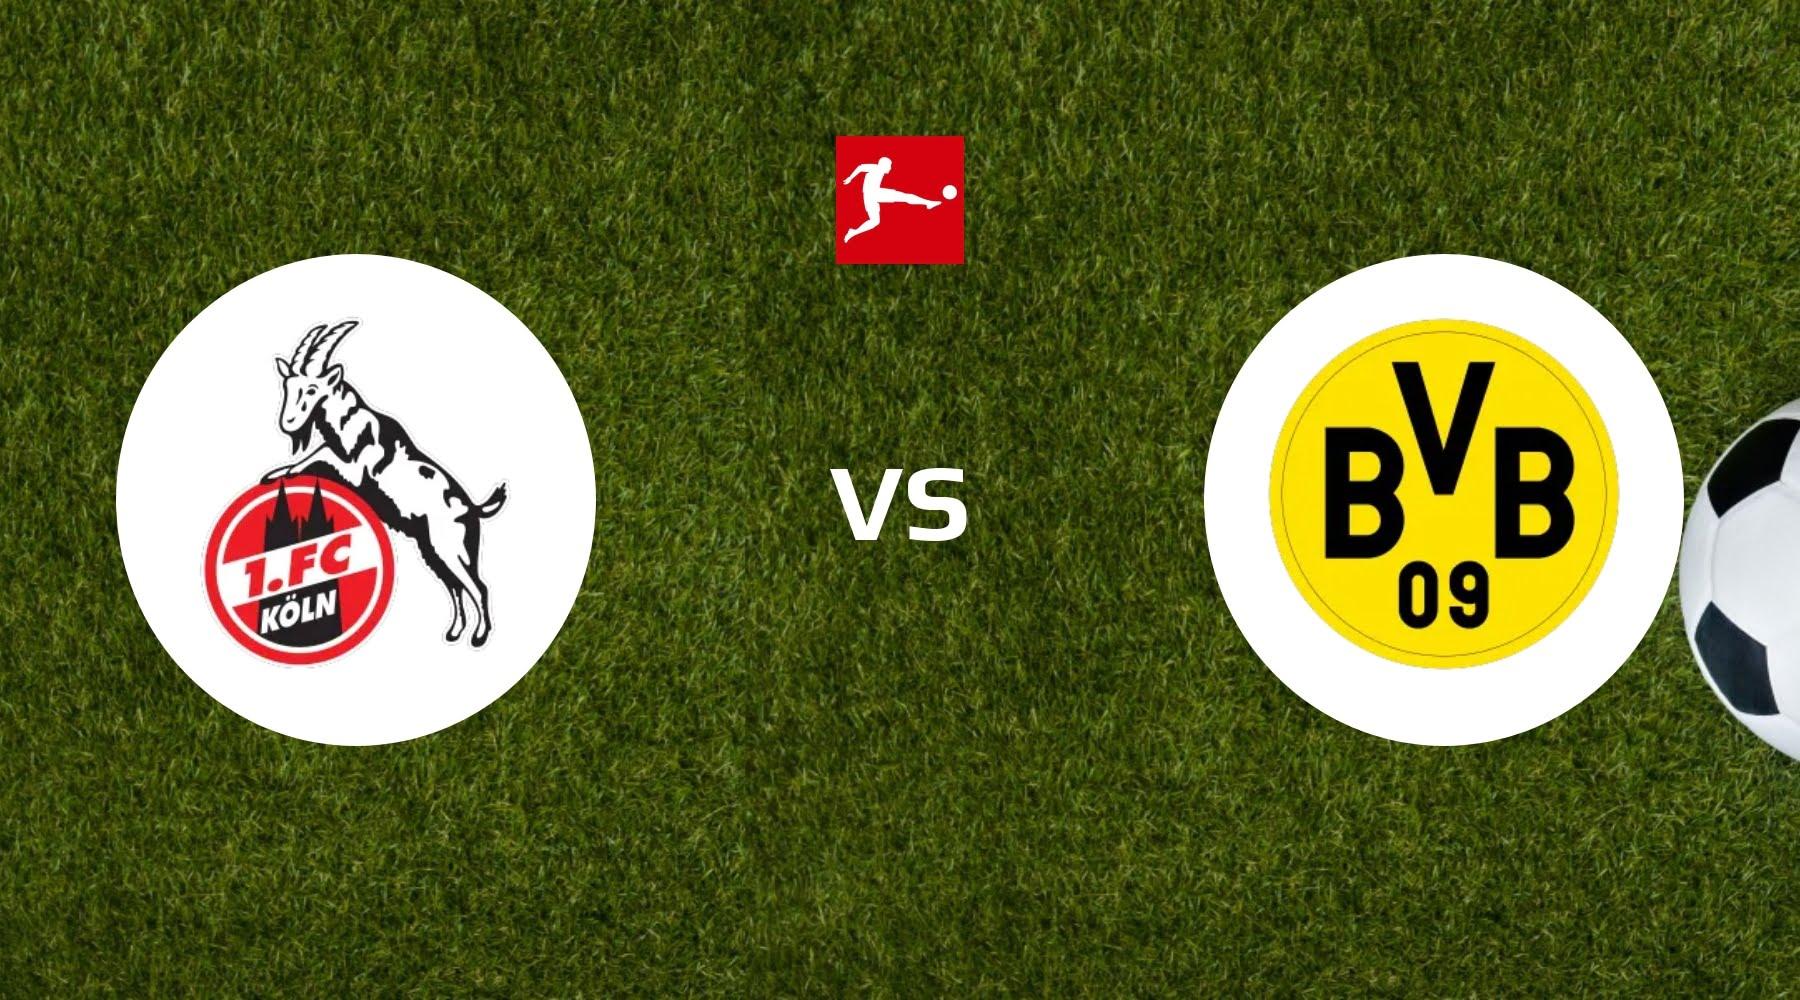 FC Köln vs Borussia Dortmund Betting